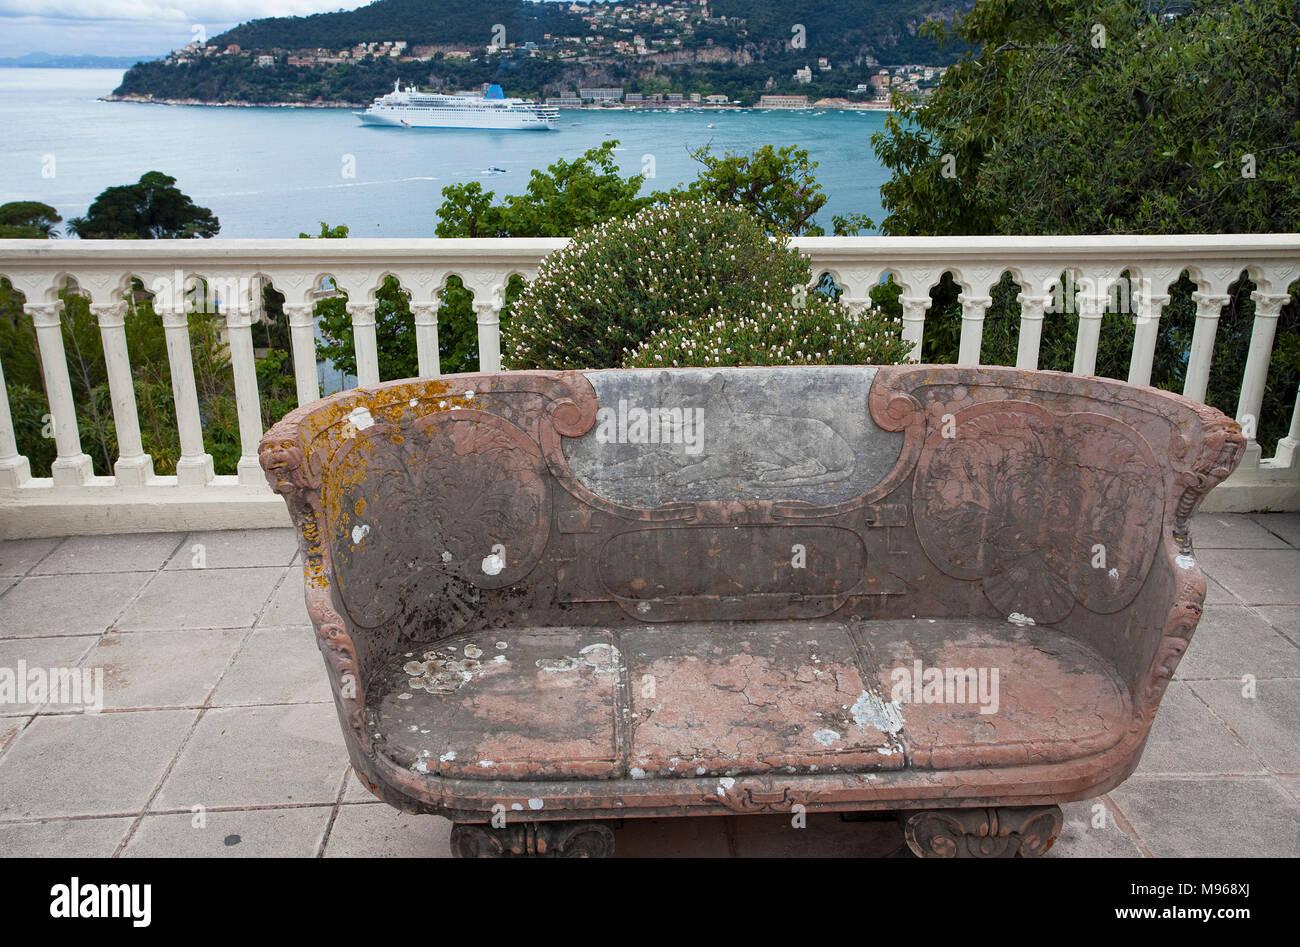 Ancient bench at garden of Villa Ephrussi de Rothschild, tuscan architecture at Cape Ferrat, South France, Var, Cote Azur, France, Europe - Stock Image